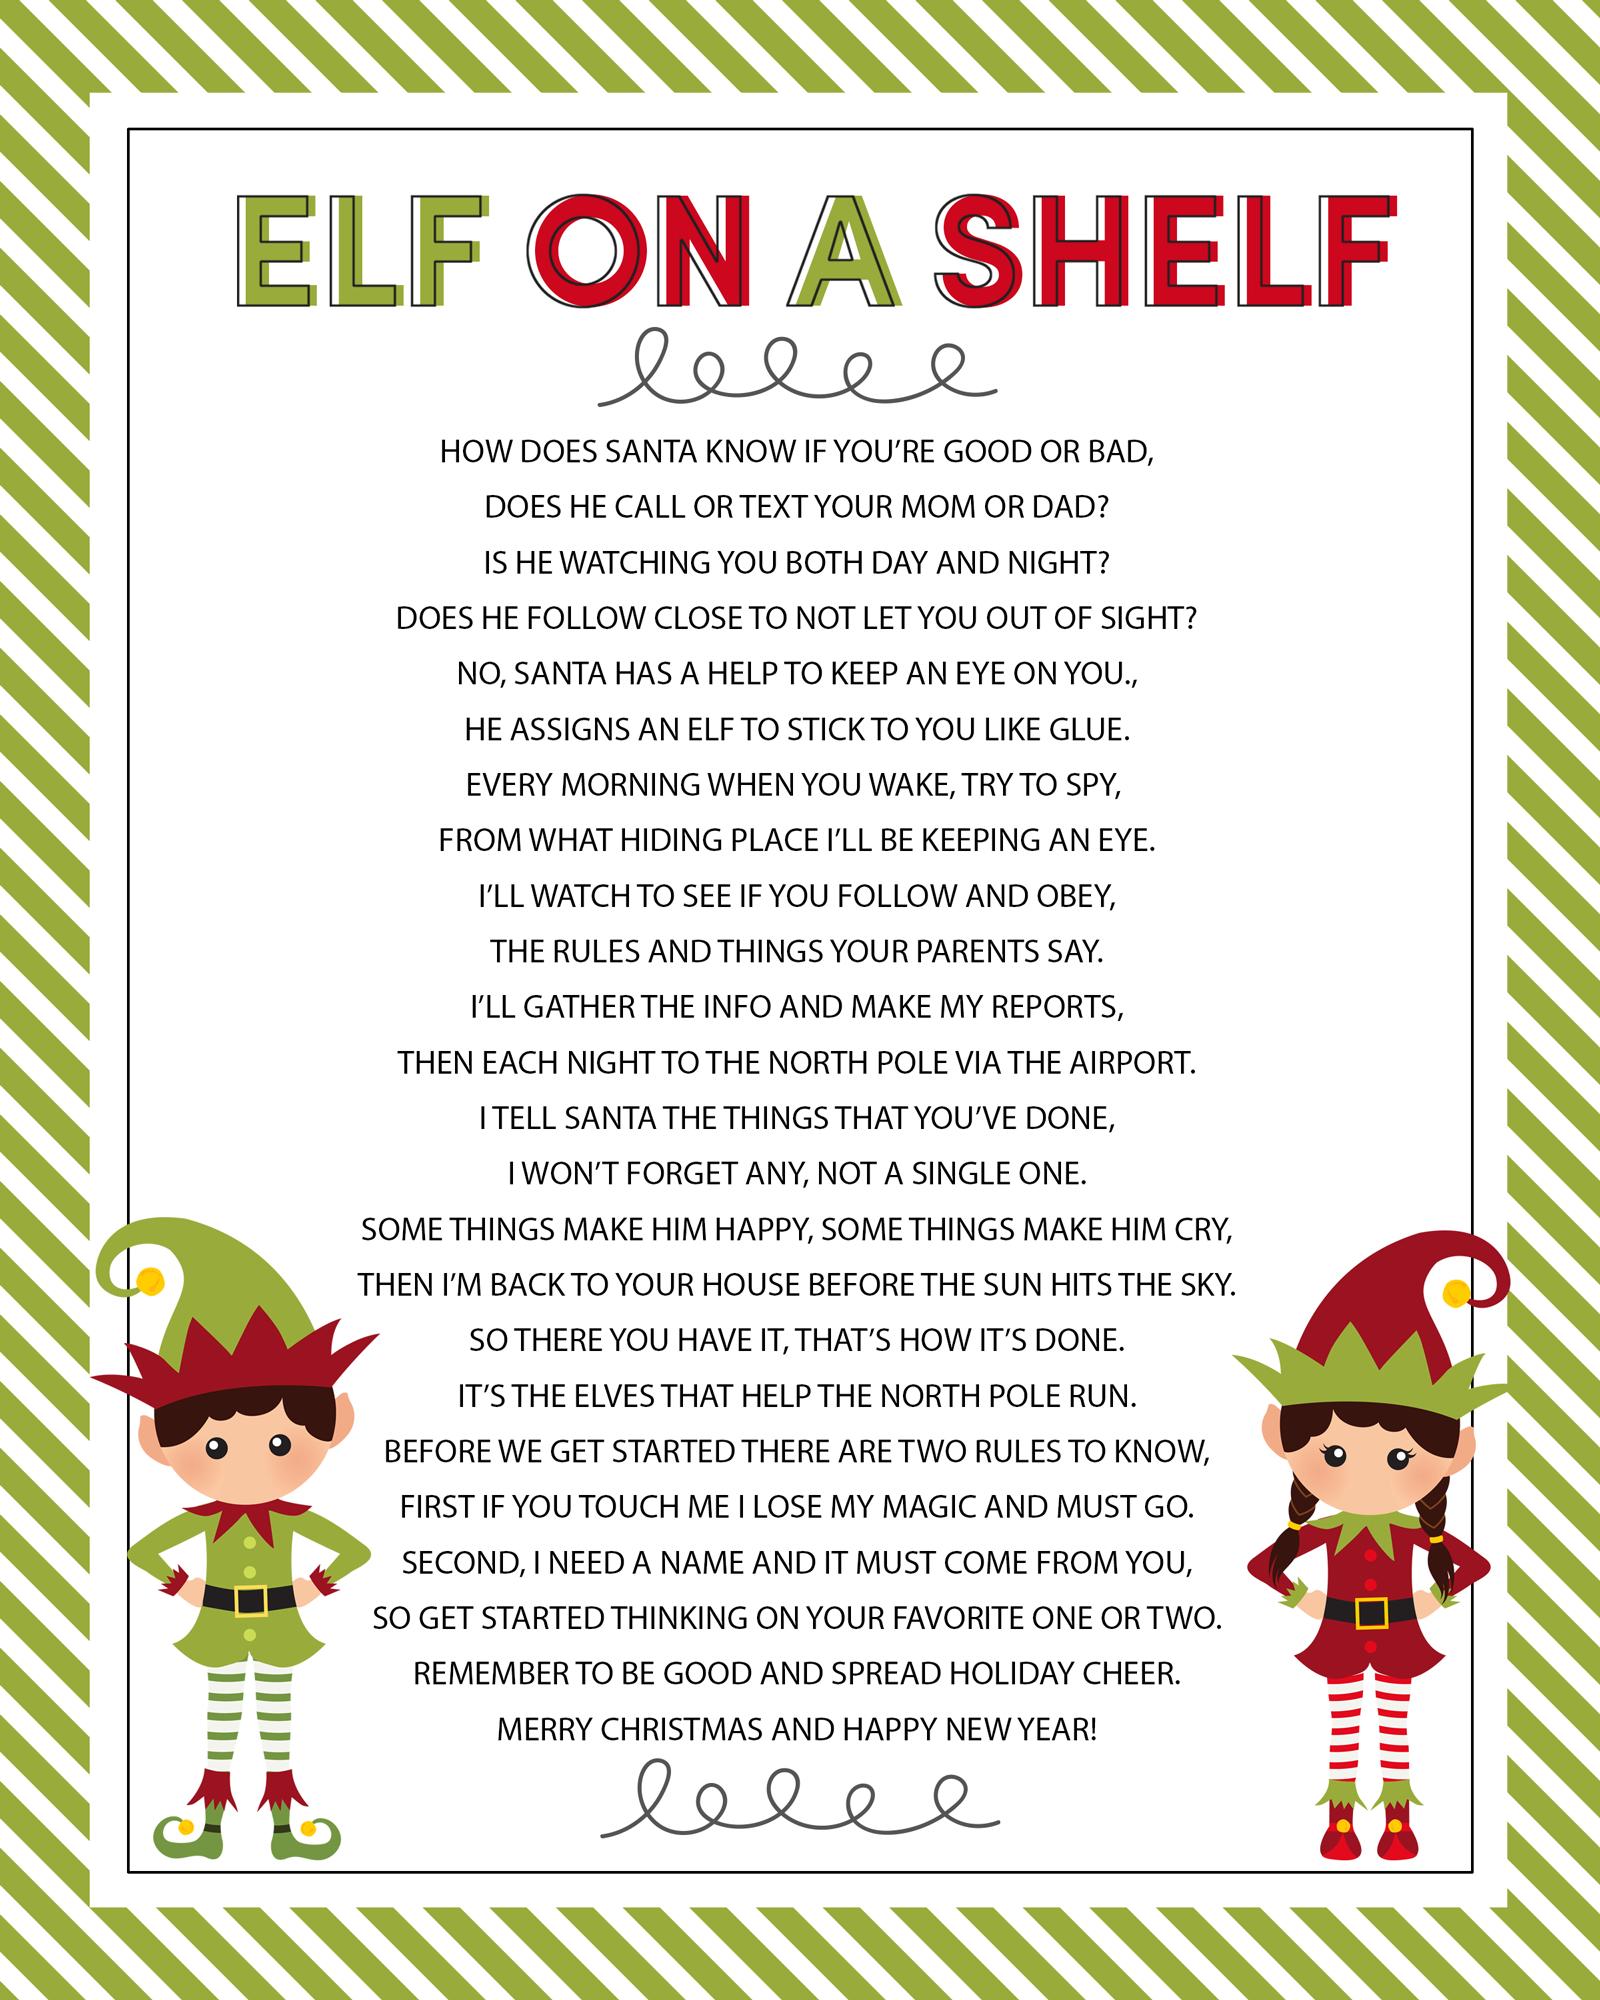 Elf On The Shelf Story - Free Printable Poem - Lil' Luna - Free Elf On The Shelf Printables